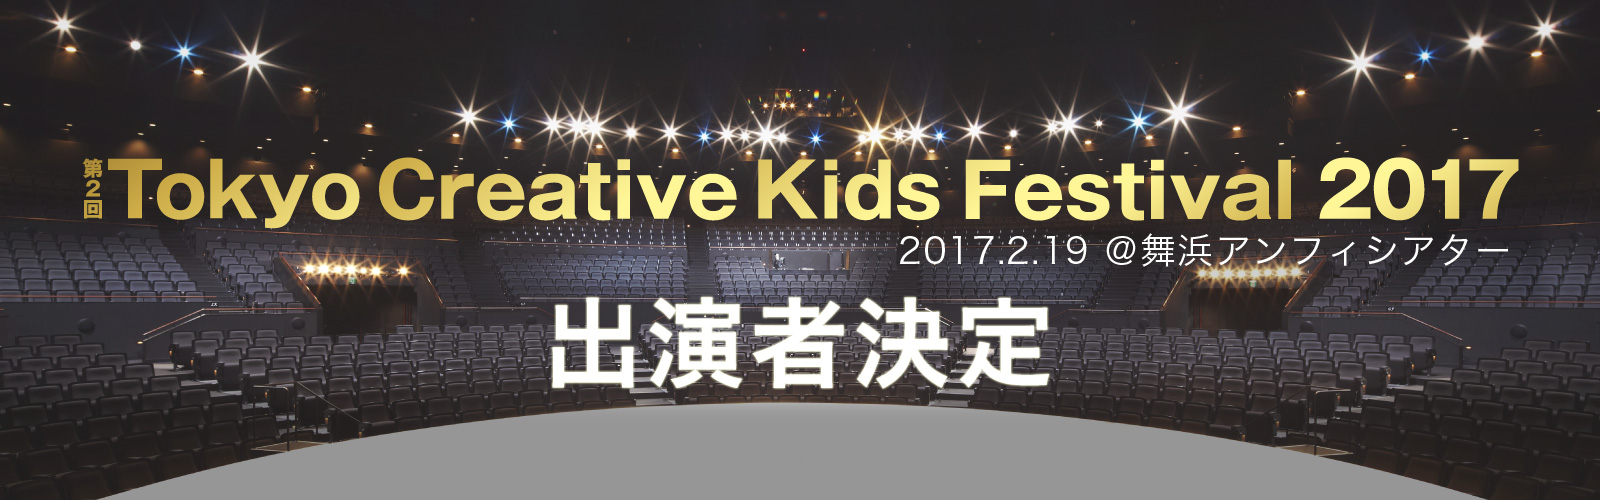 Tokyo Creative Kids Festival 2017選出者発表